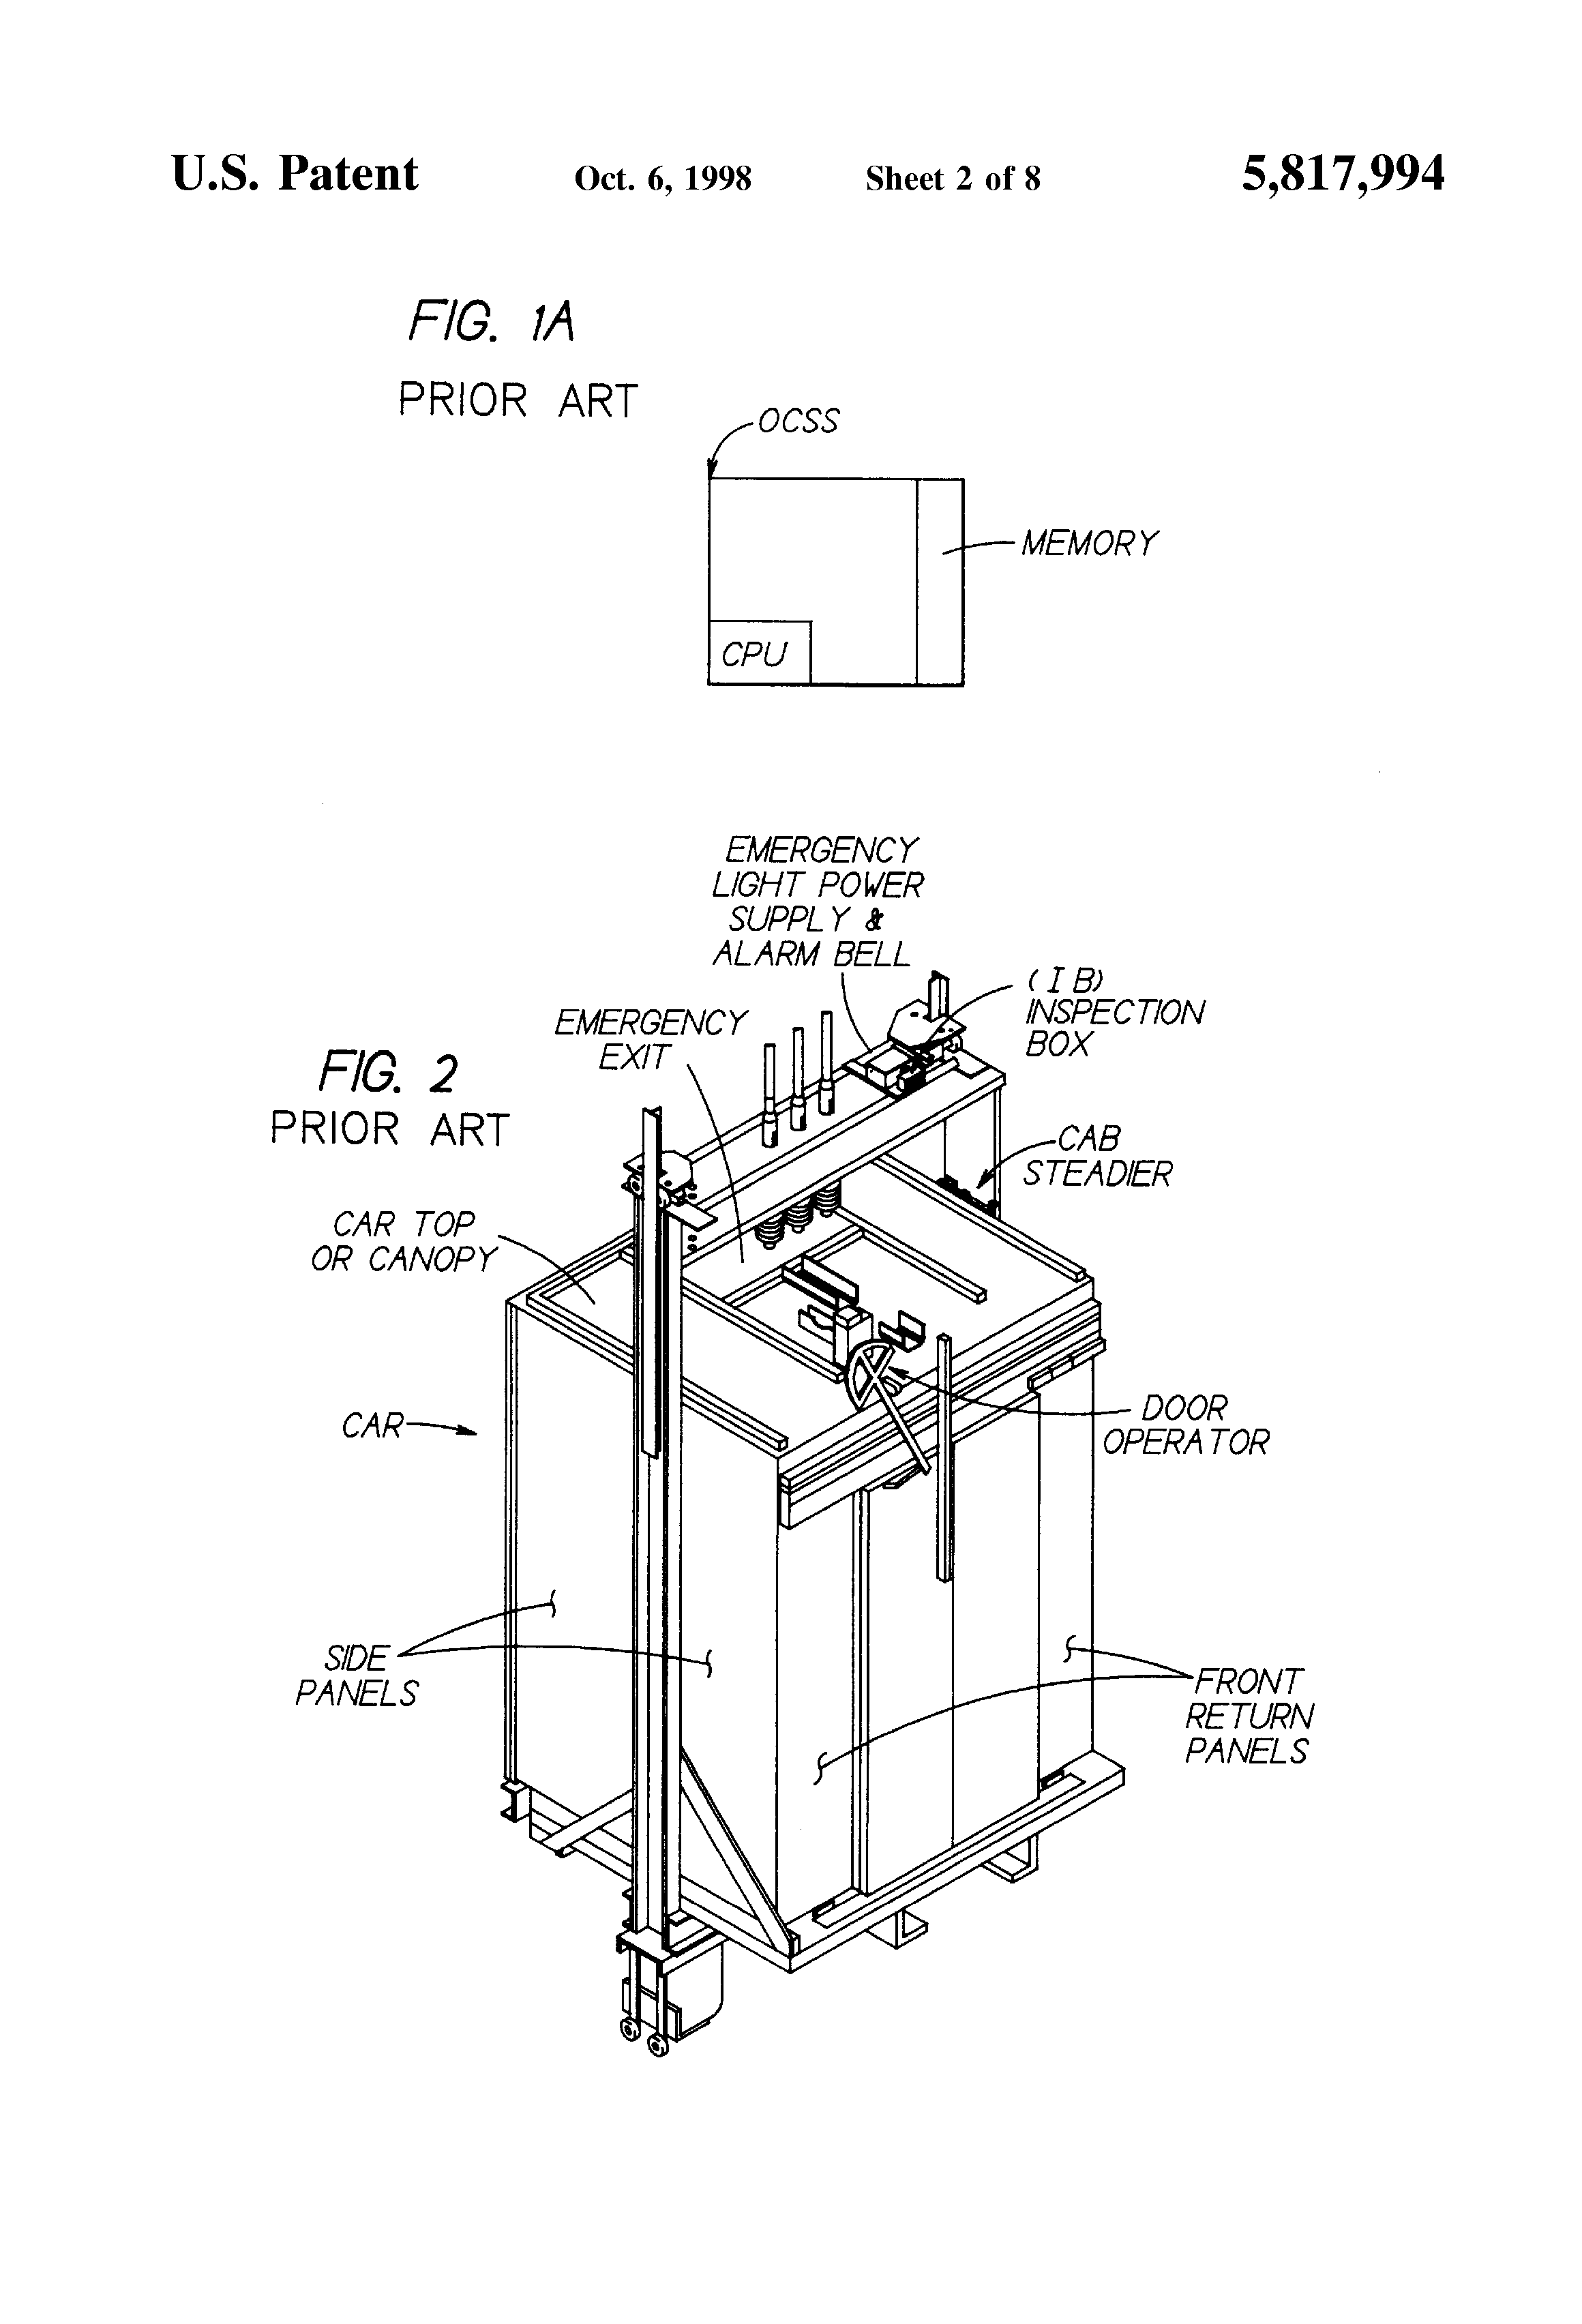 otis elevator wiring diagram patent us5817994 remote fail safe control for    elevator     patent us5817994 remote fail safe control for    elevator